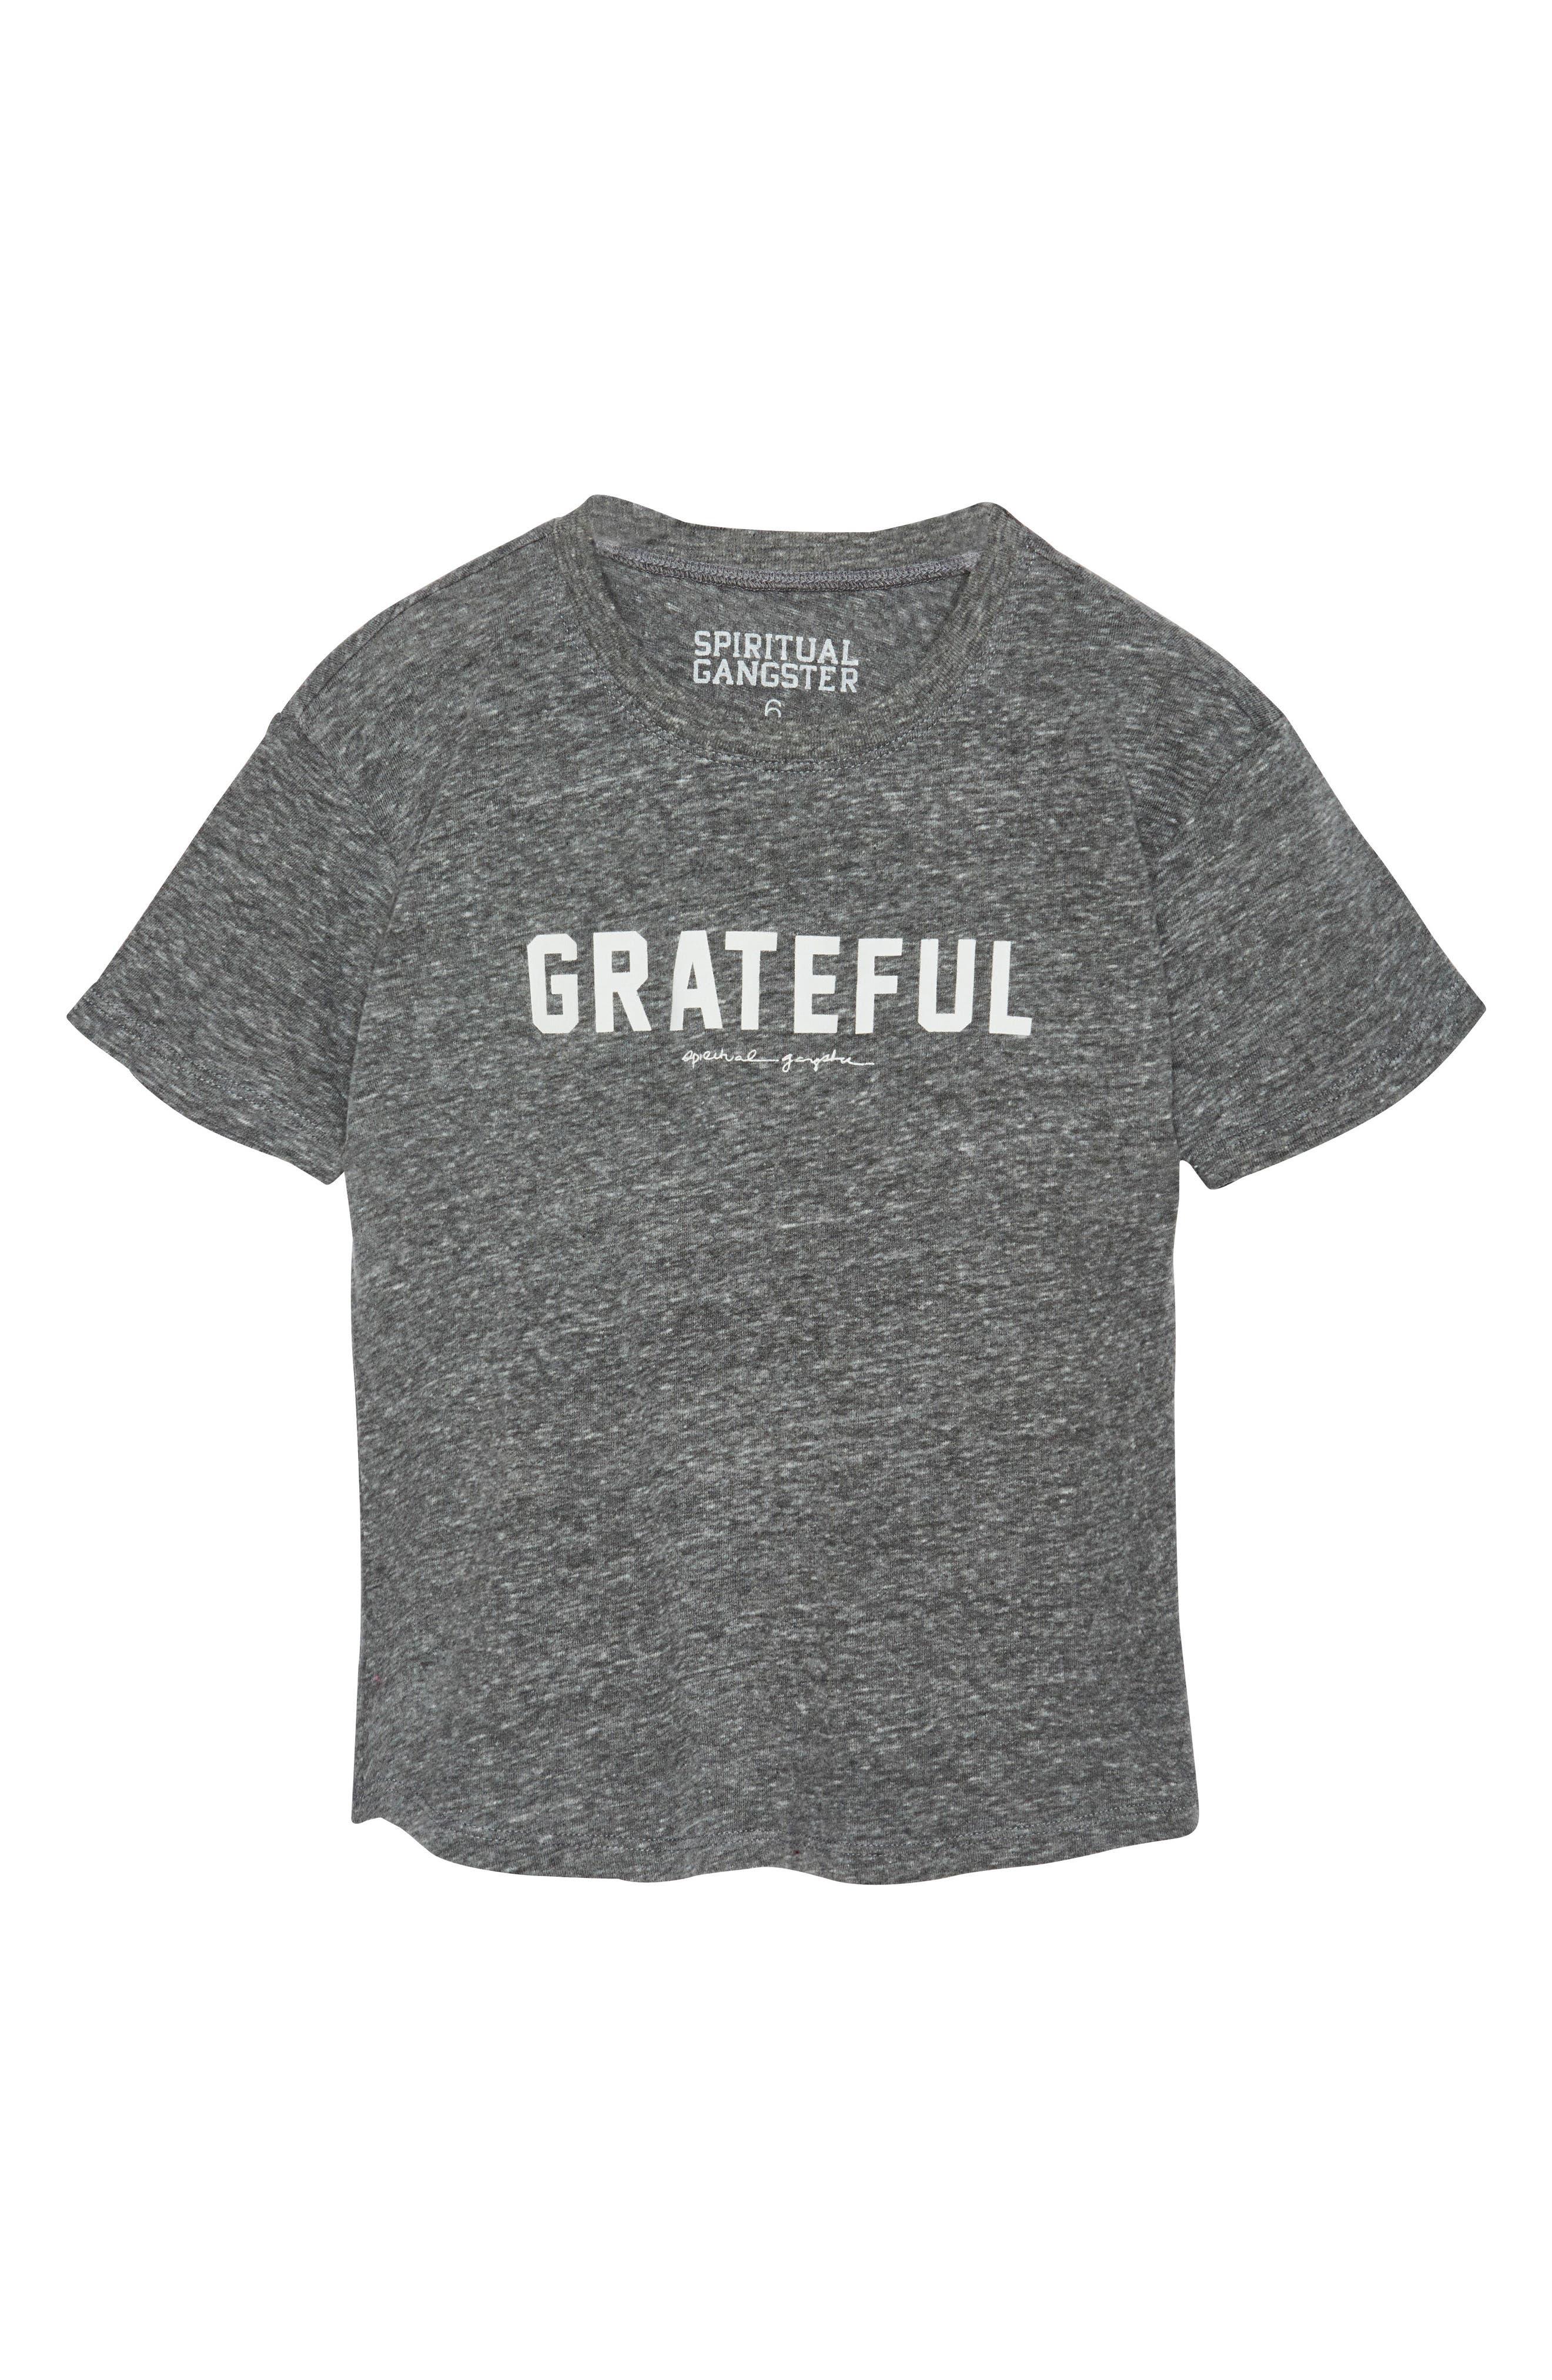 Alternate Image 1 Selected - Spiritual Gangster Varsity Grateful Graphic T-Shirt (Big Boys)